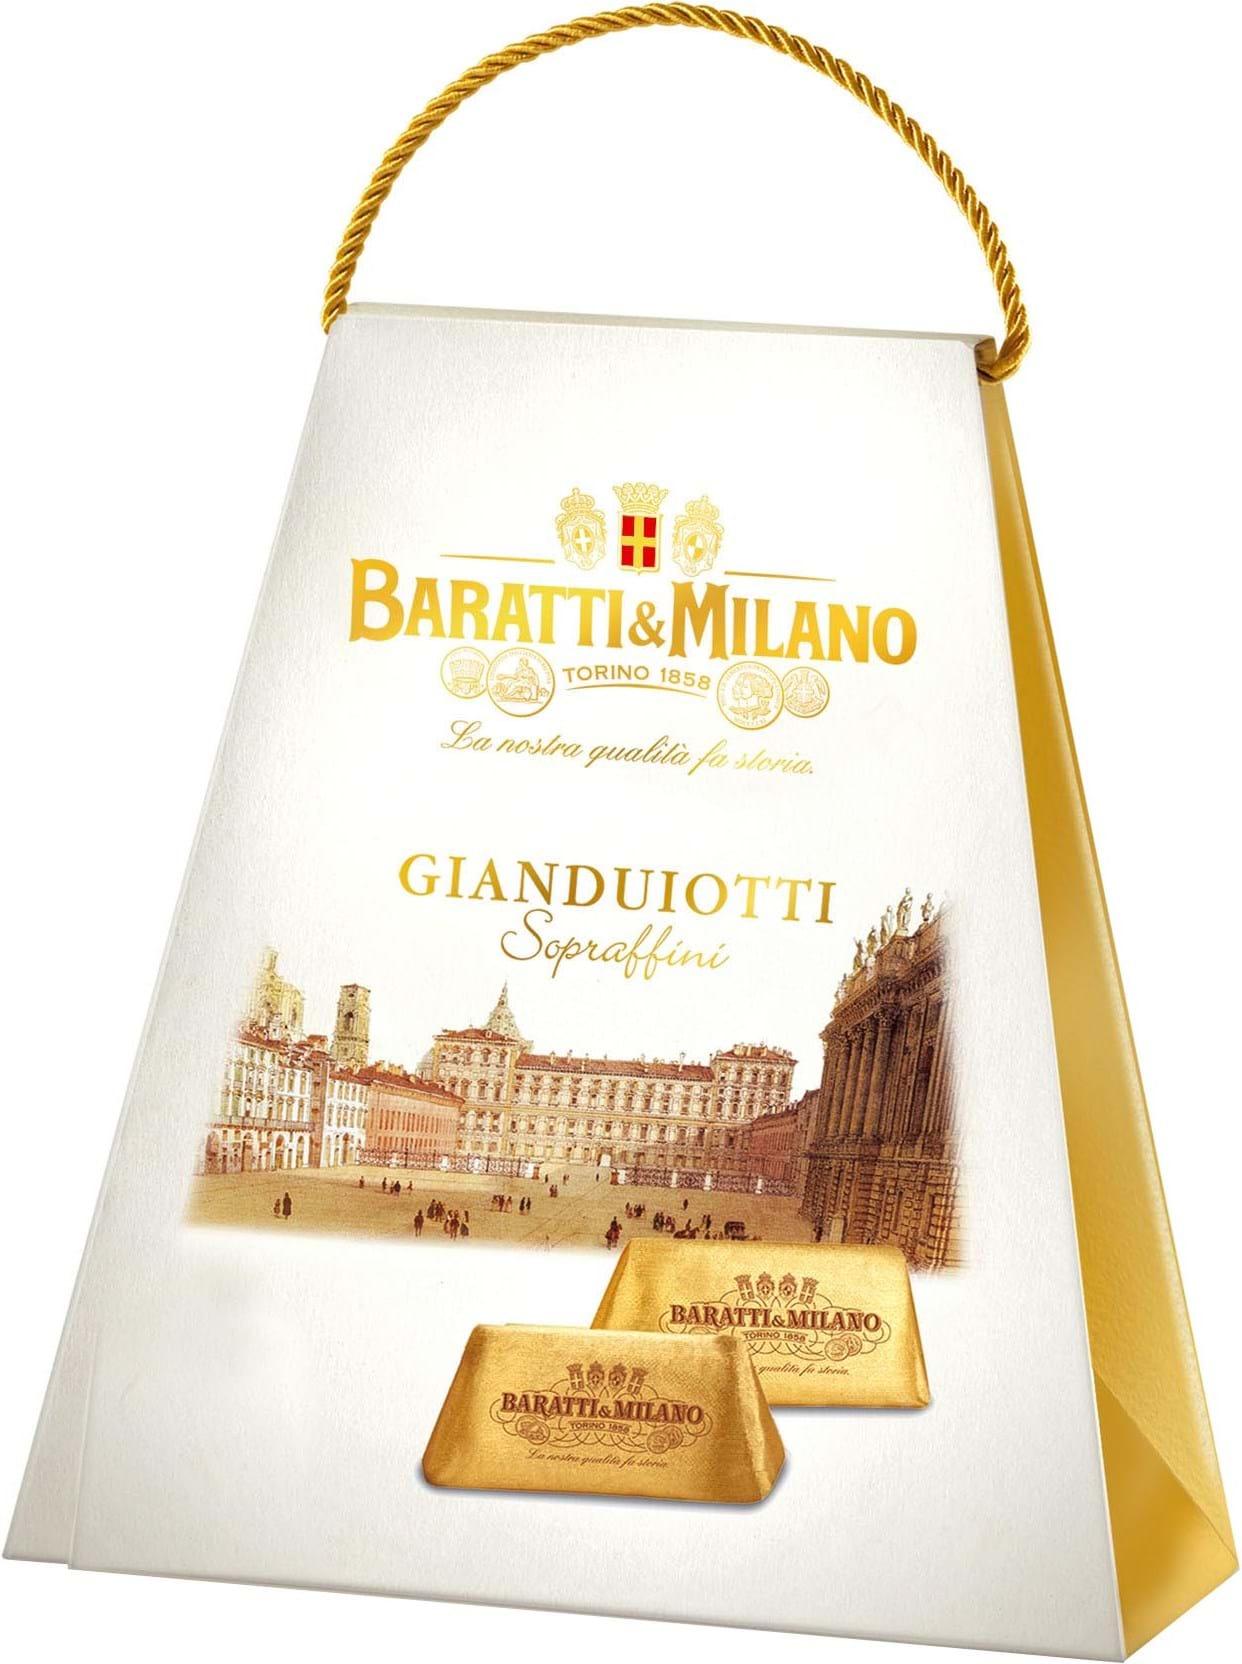 Baratti & Milano Gianduiotti Ballotin 180g